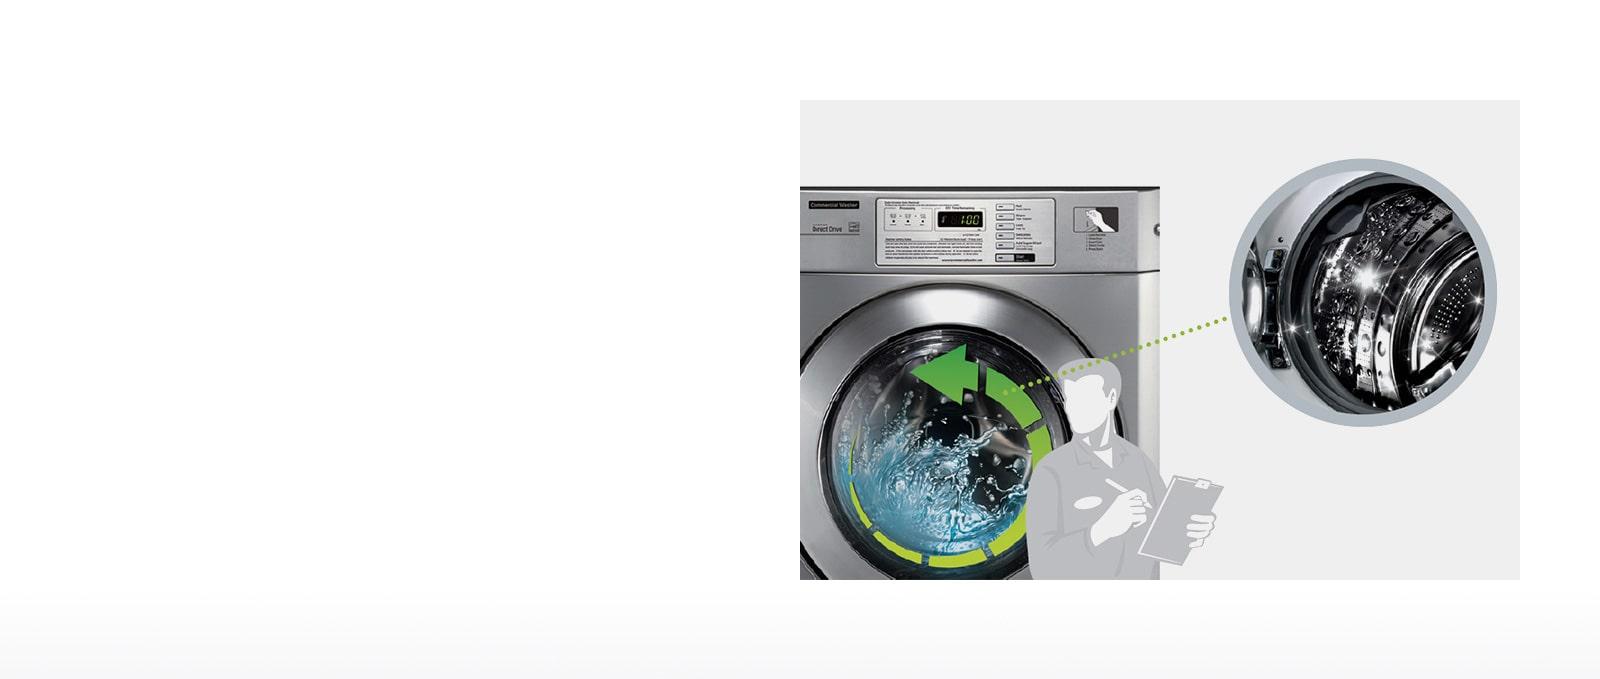 Giant C Washing Machine: Commercial Laundry Equipment   LG ...